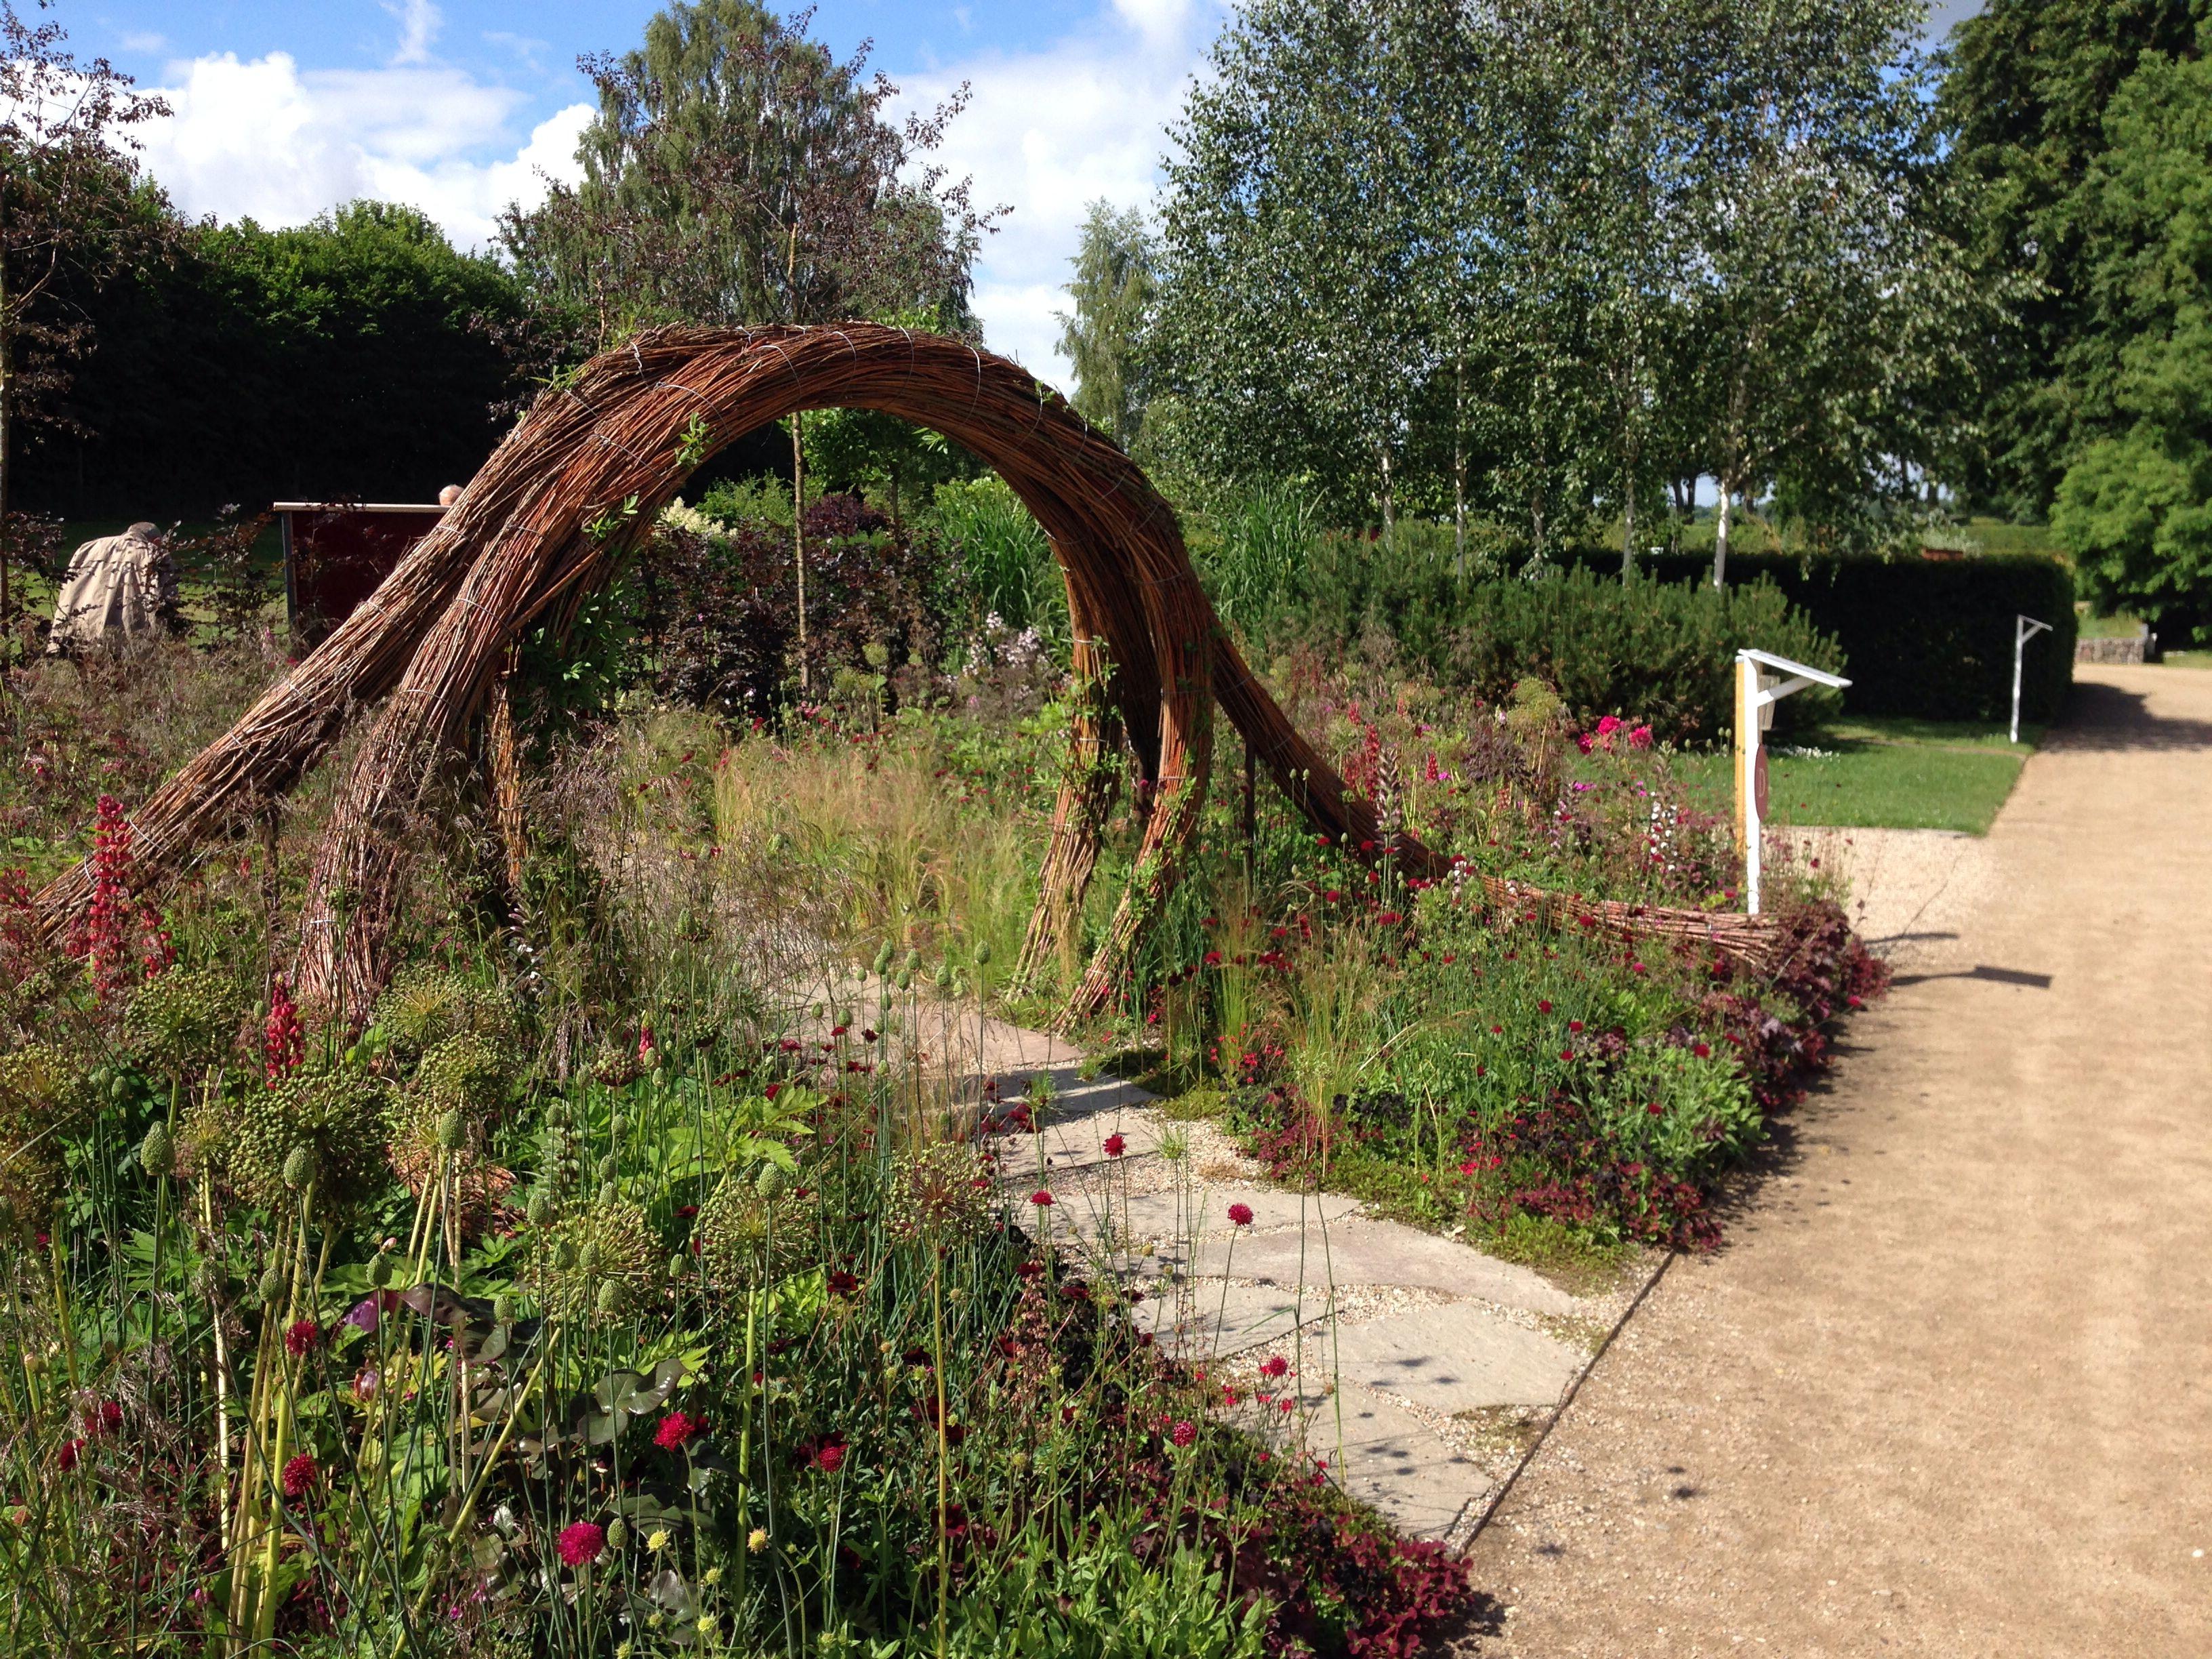 Magische Gärten 2014 | Park&Garden Country Fair | Pinterest | Garden ...